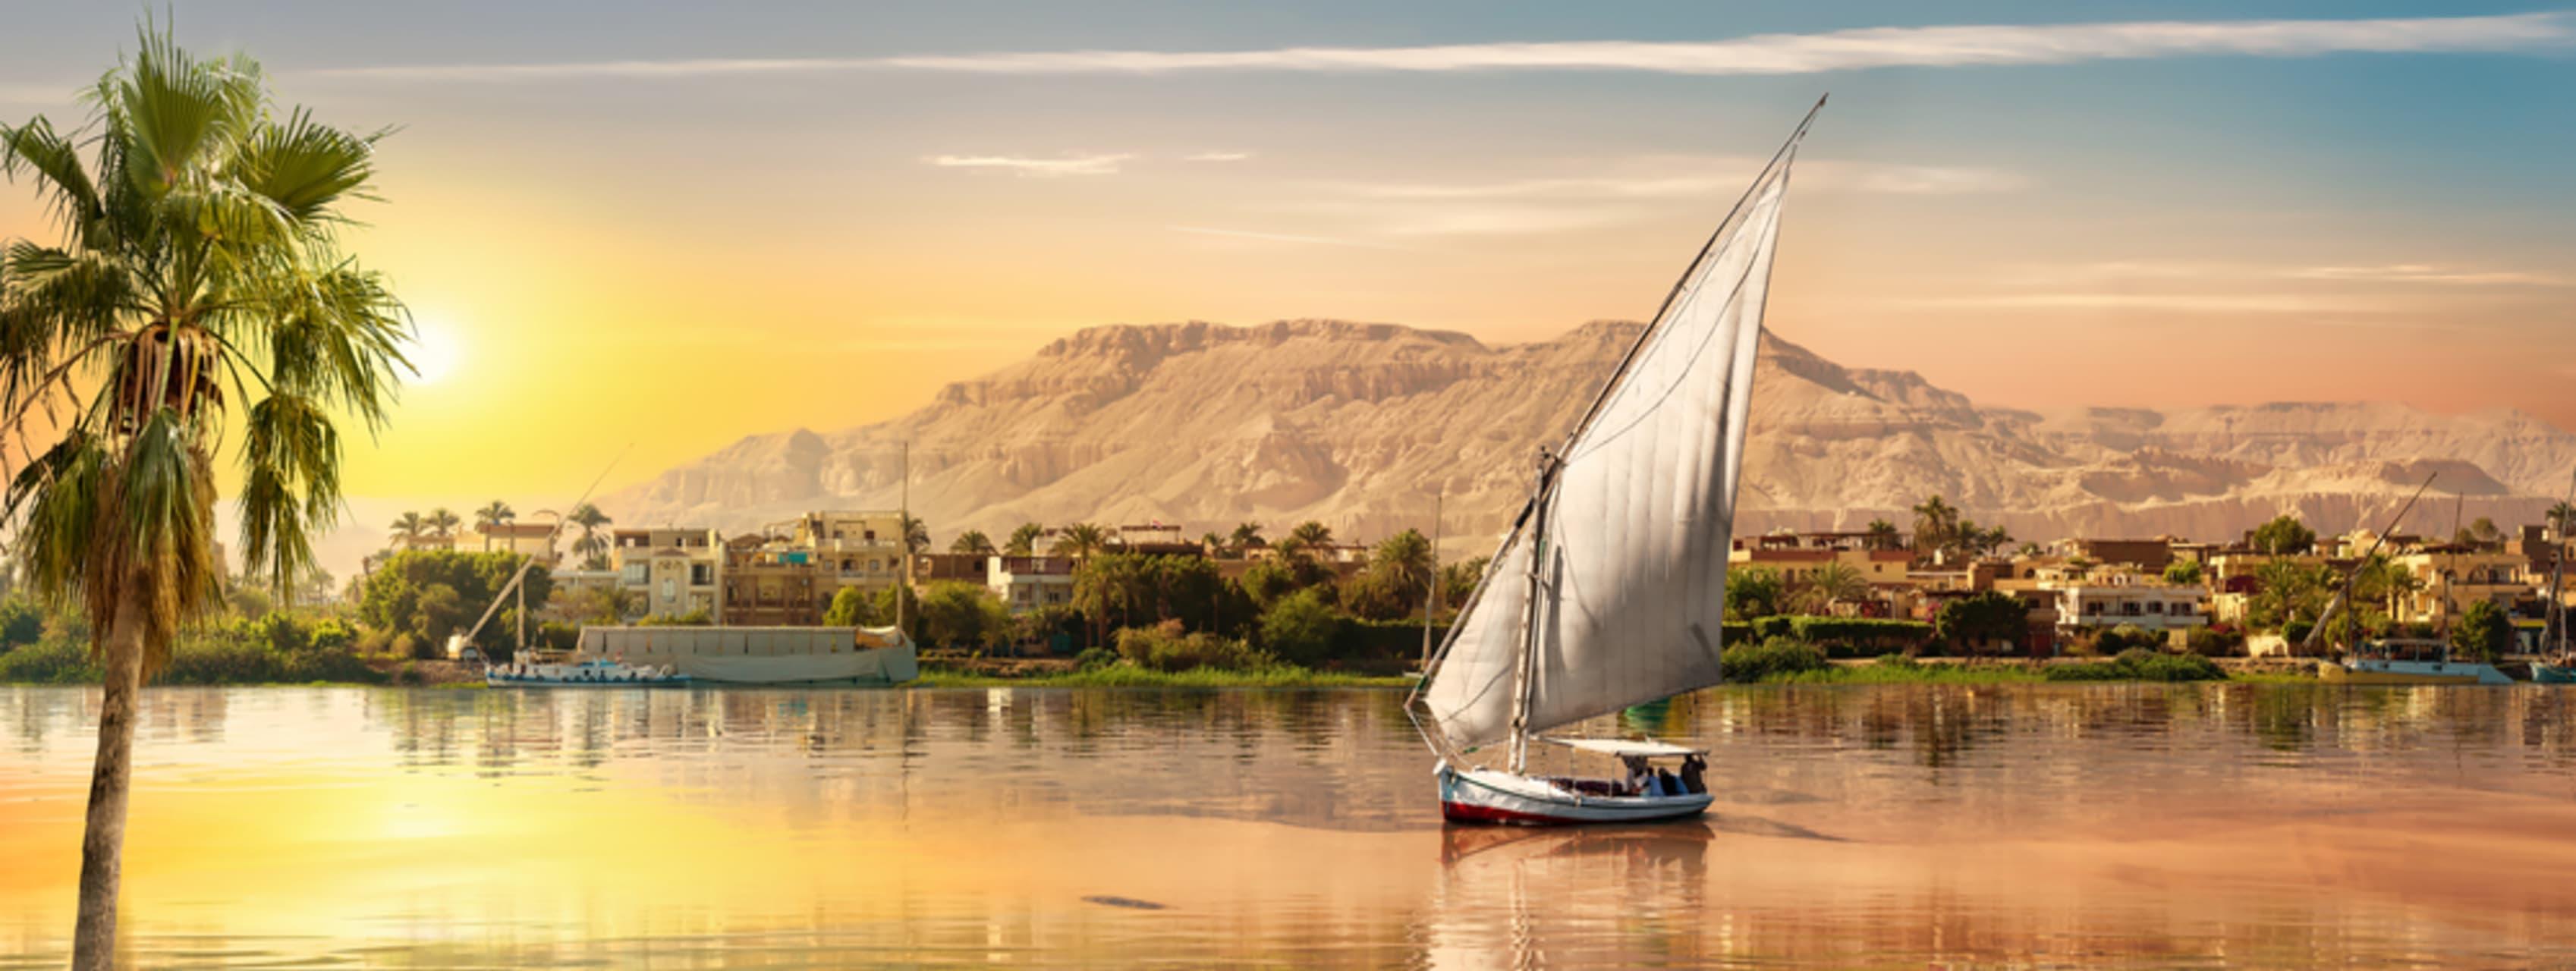 Aswan cover image